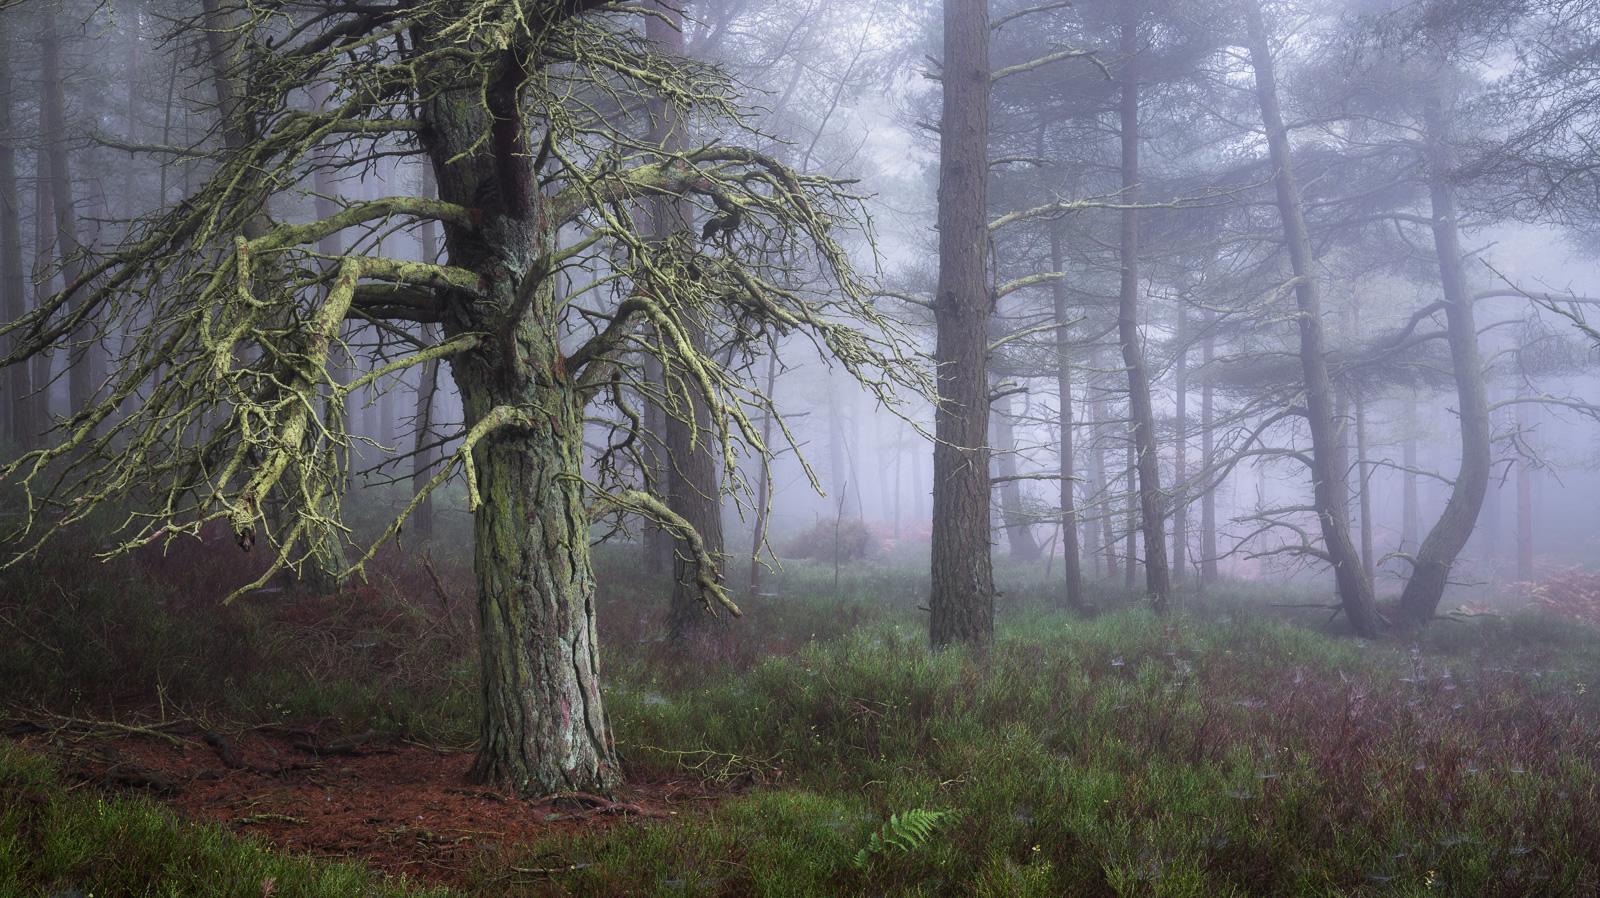 Treebeard, LOTR